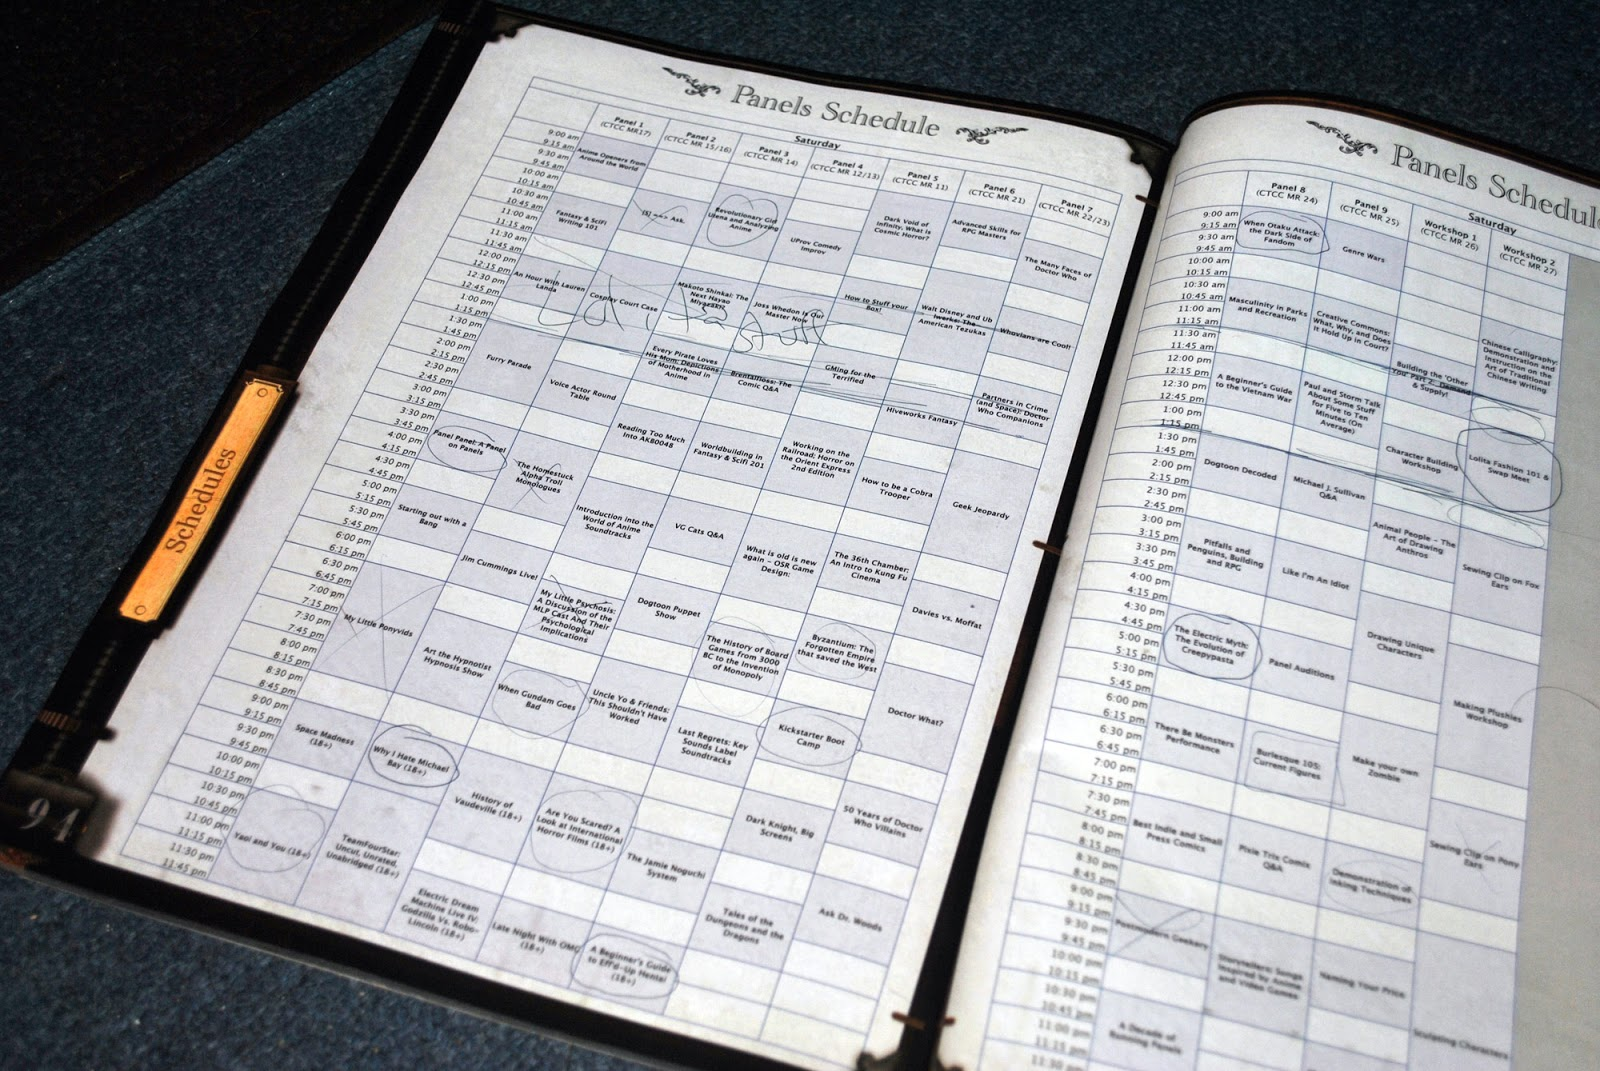 Connecticon 2013 saturday panel schedule